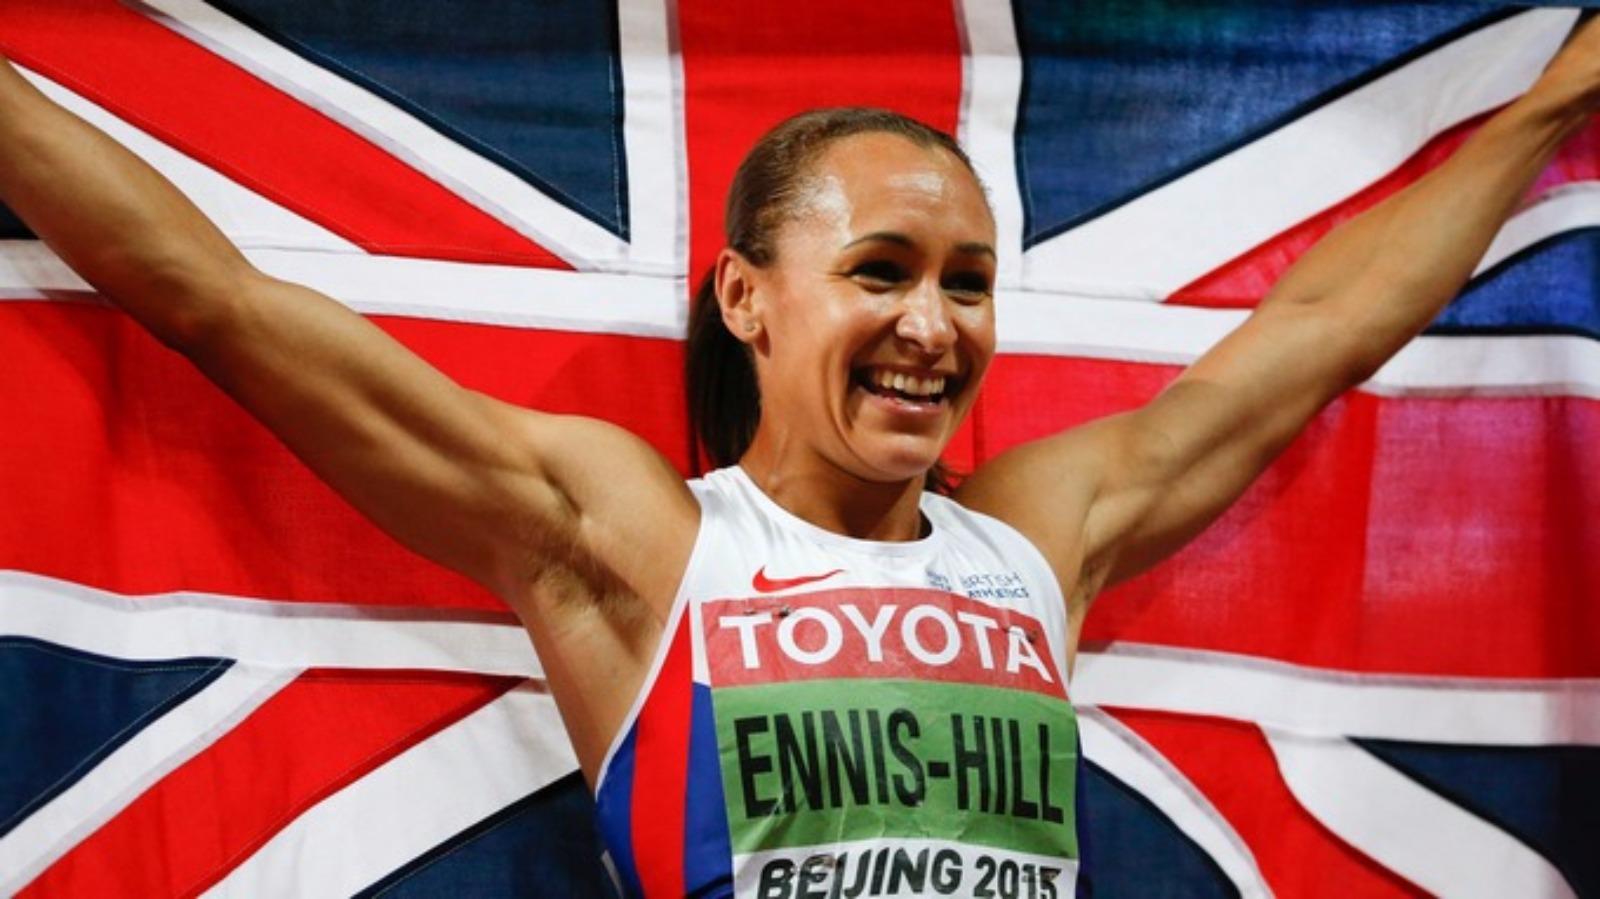 ... gold at 2015 World Championships in Beijing | Calendar - ITV News